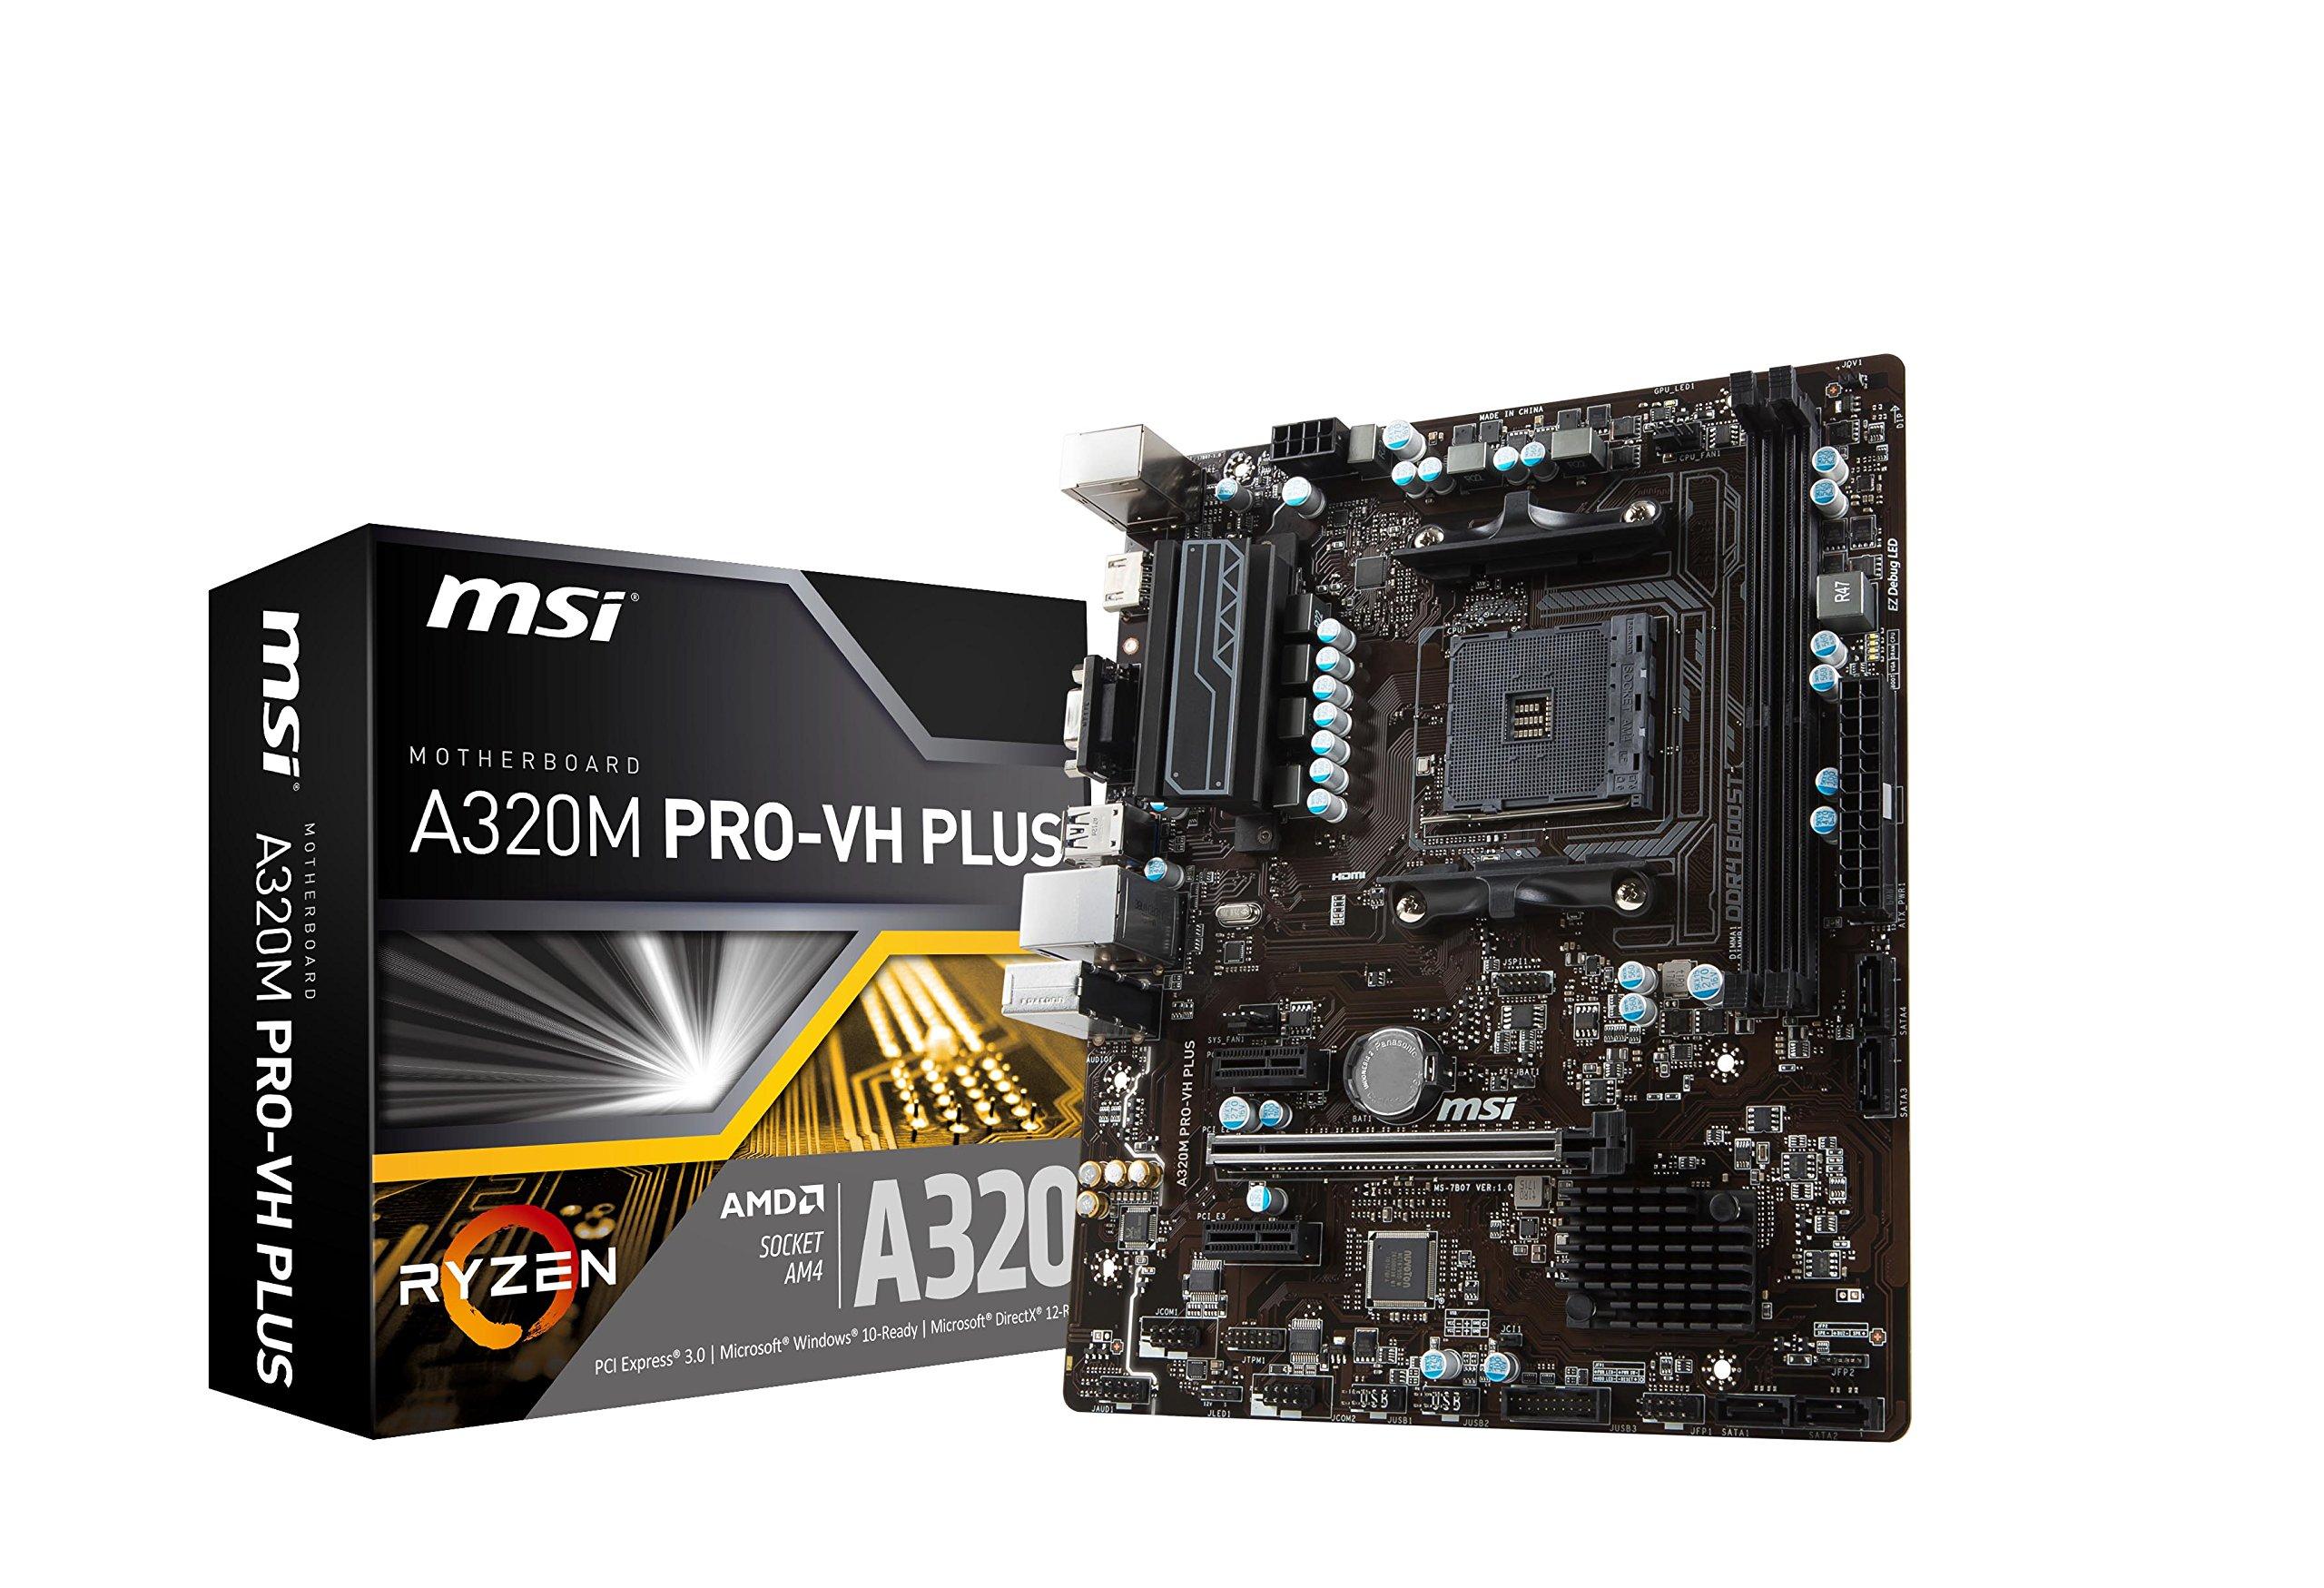 MSI ProSeries AMD Ryzen A320 DDR4 VR Ready HDMI USB 3 micro-ATX Motherboard (A320M PRO-VH PLUS) by MSI